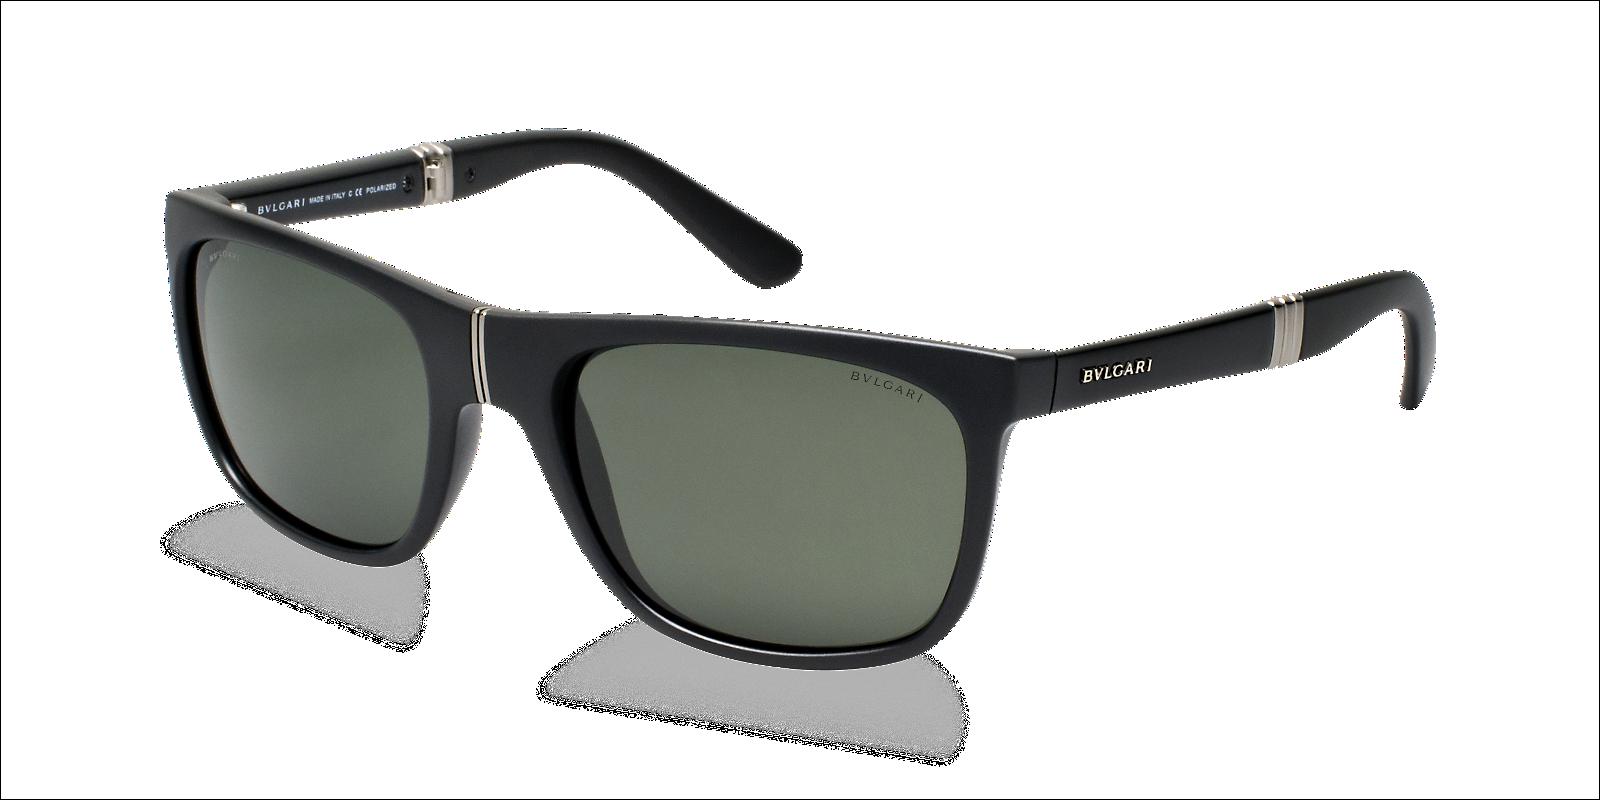 d50408e2d3 Bvlgari Sunglasses For Men Bv7013